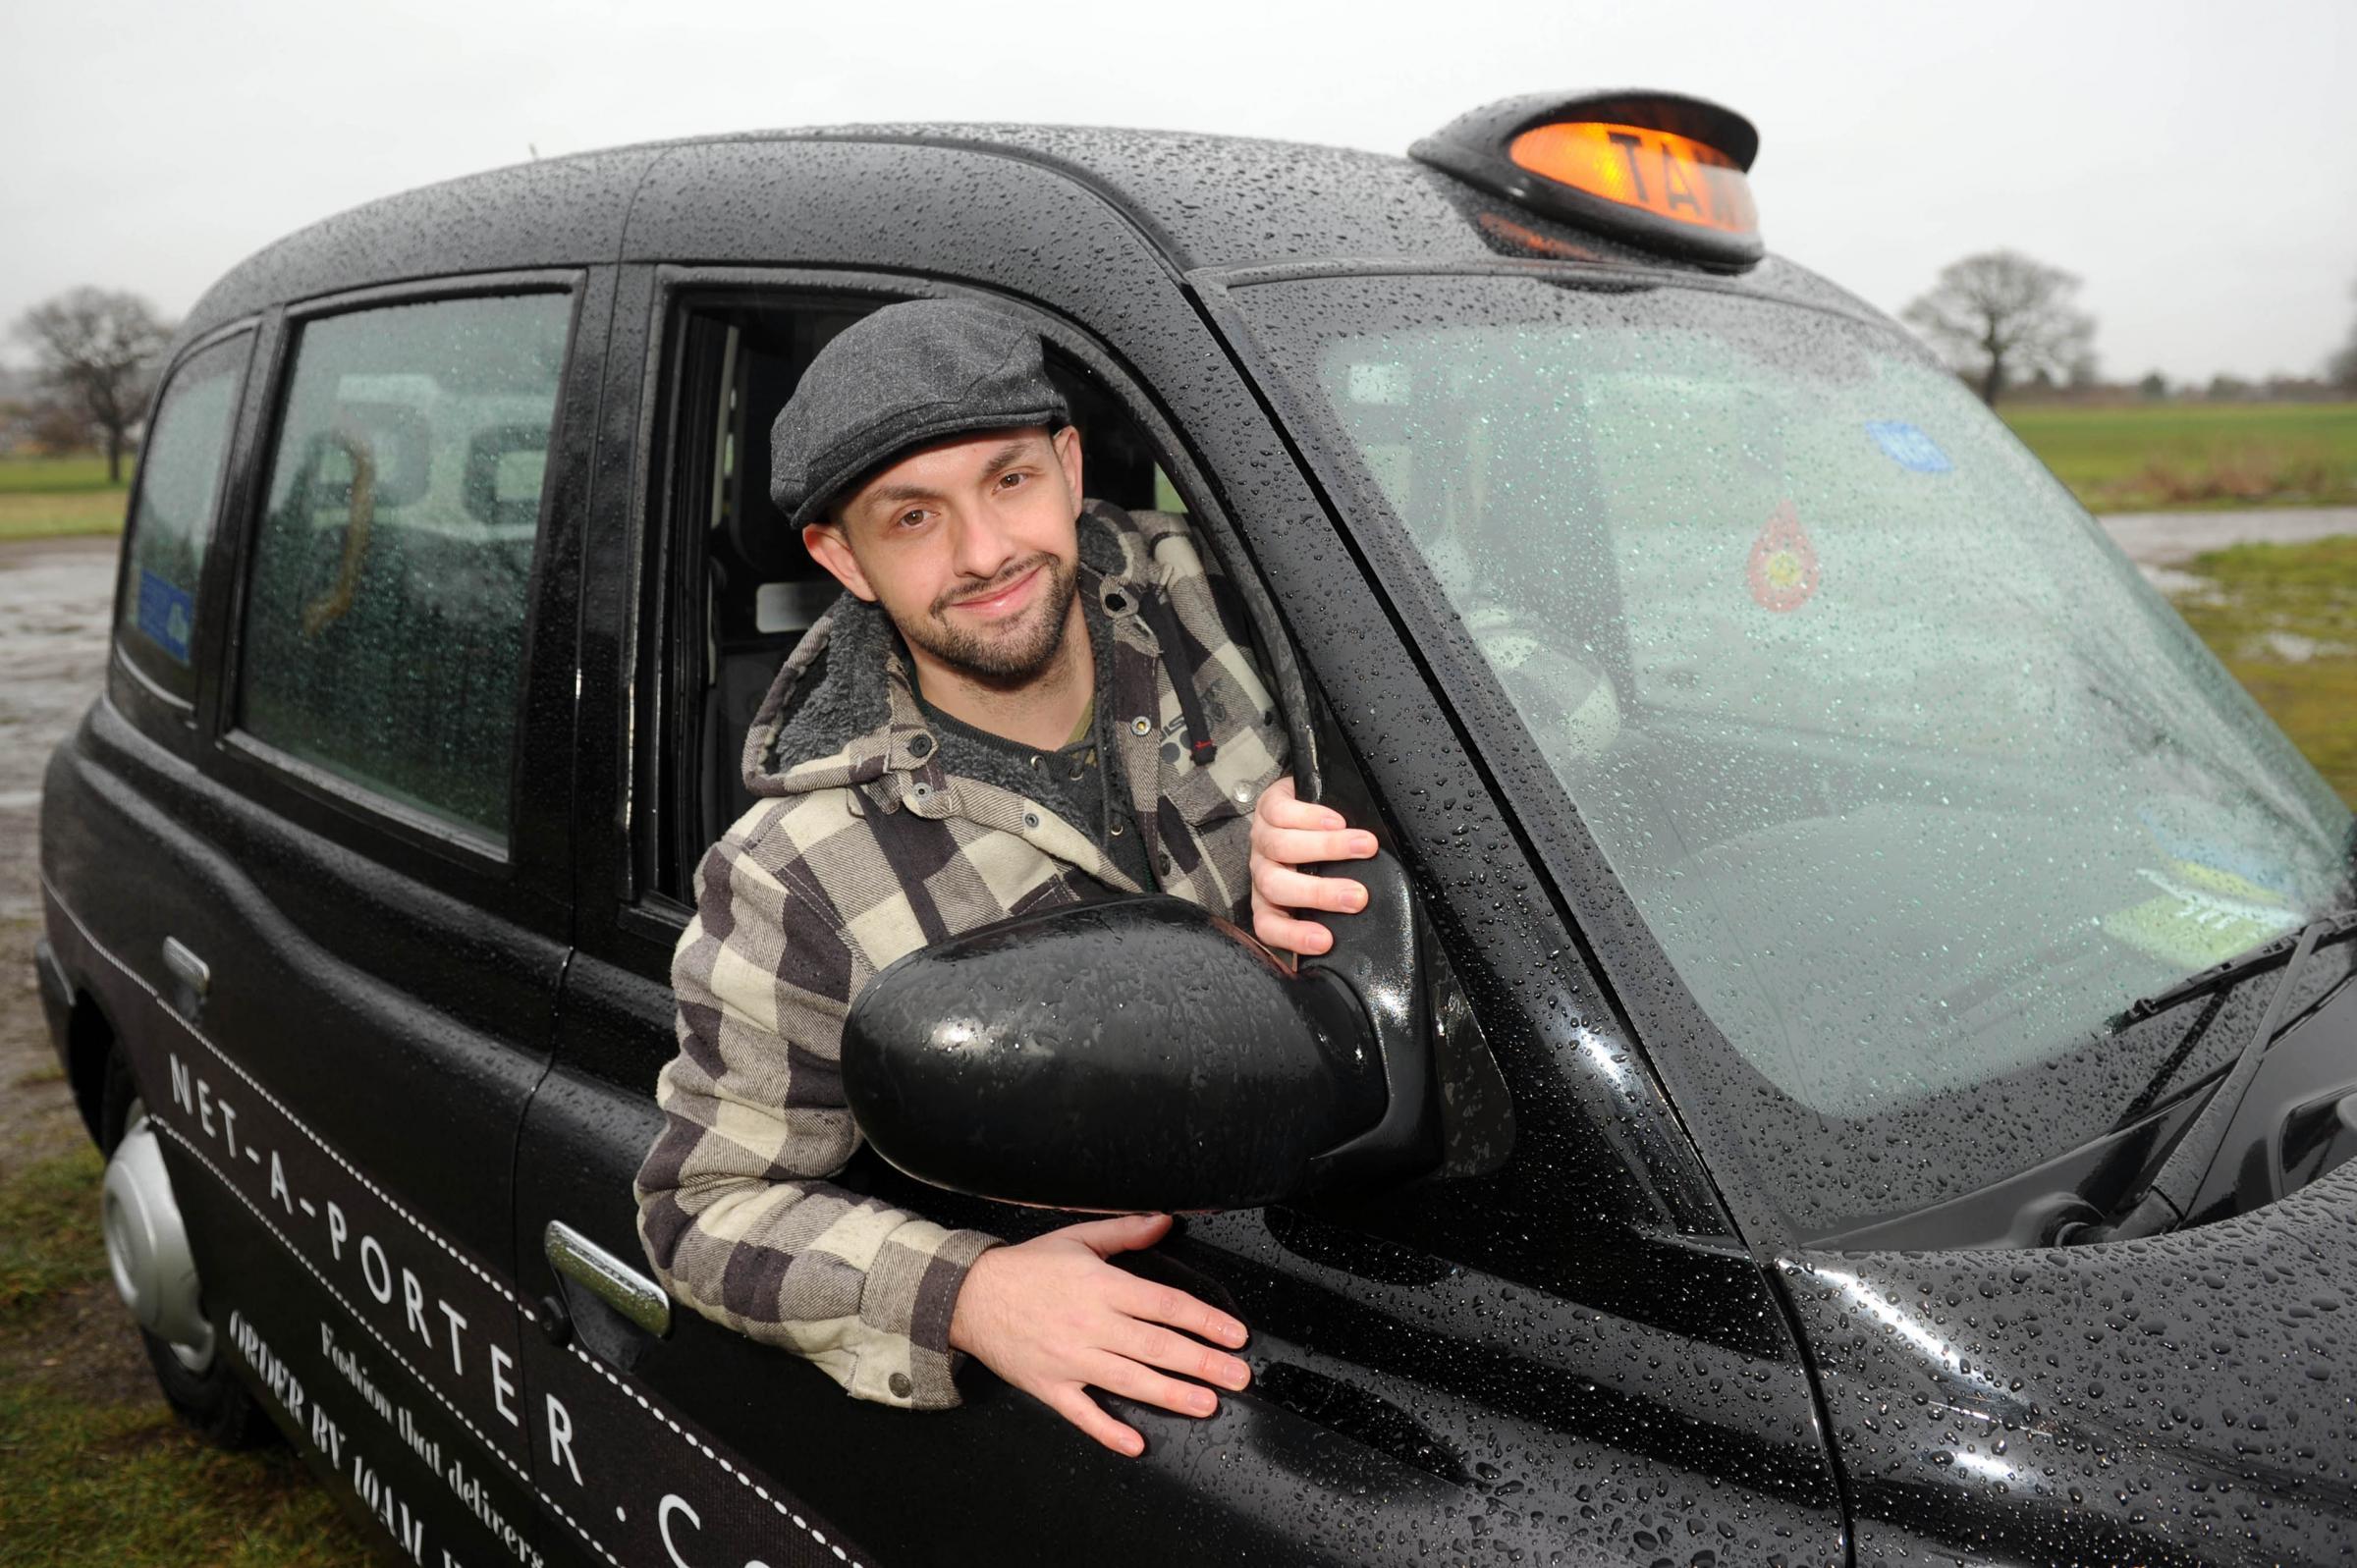 Ross Turner in his black cab